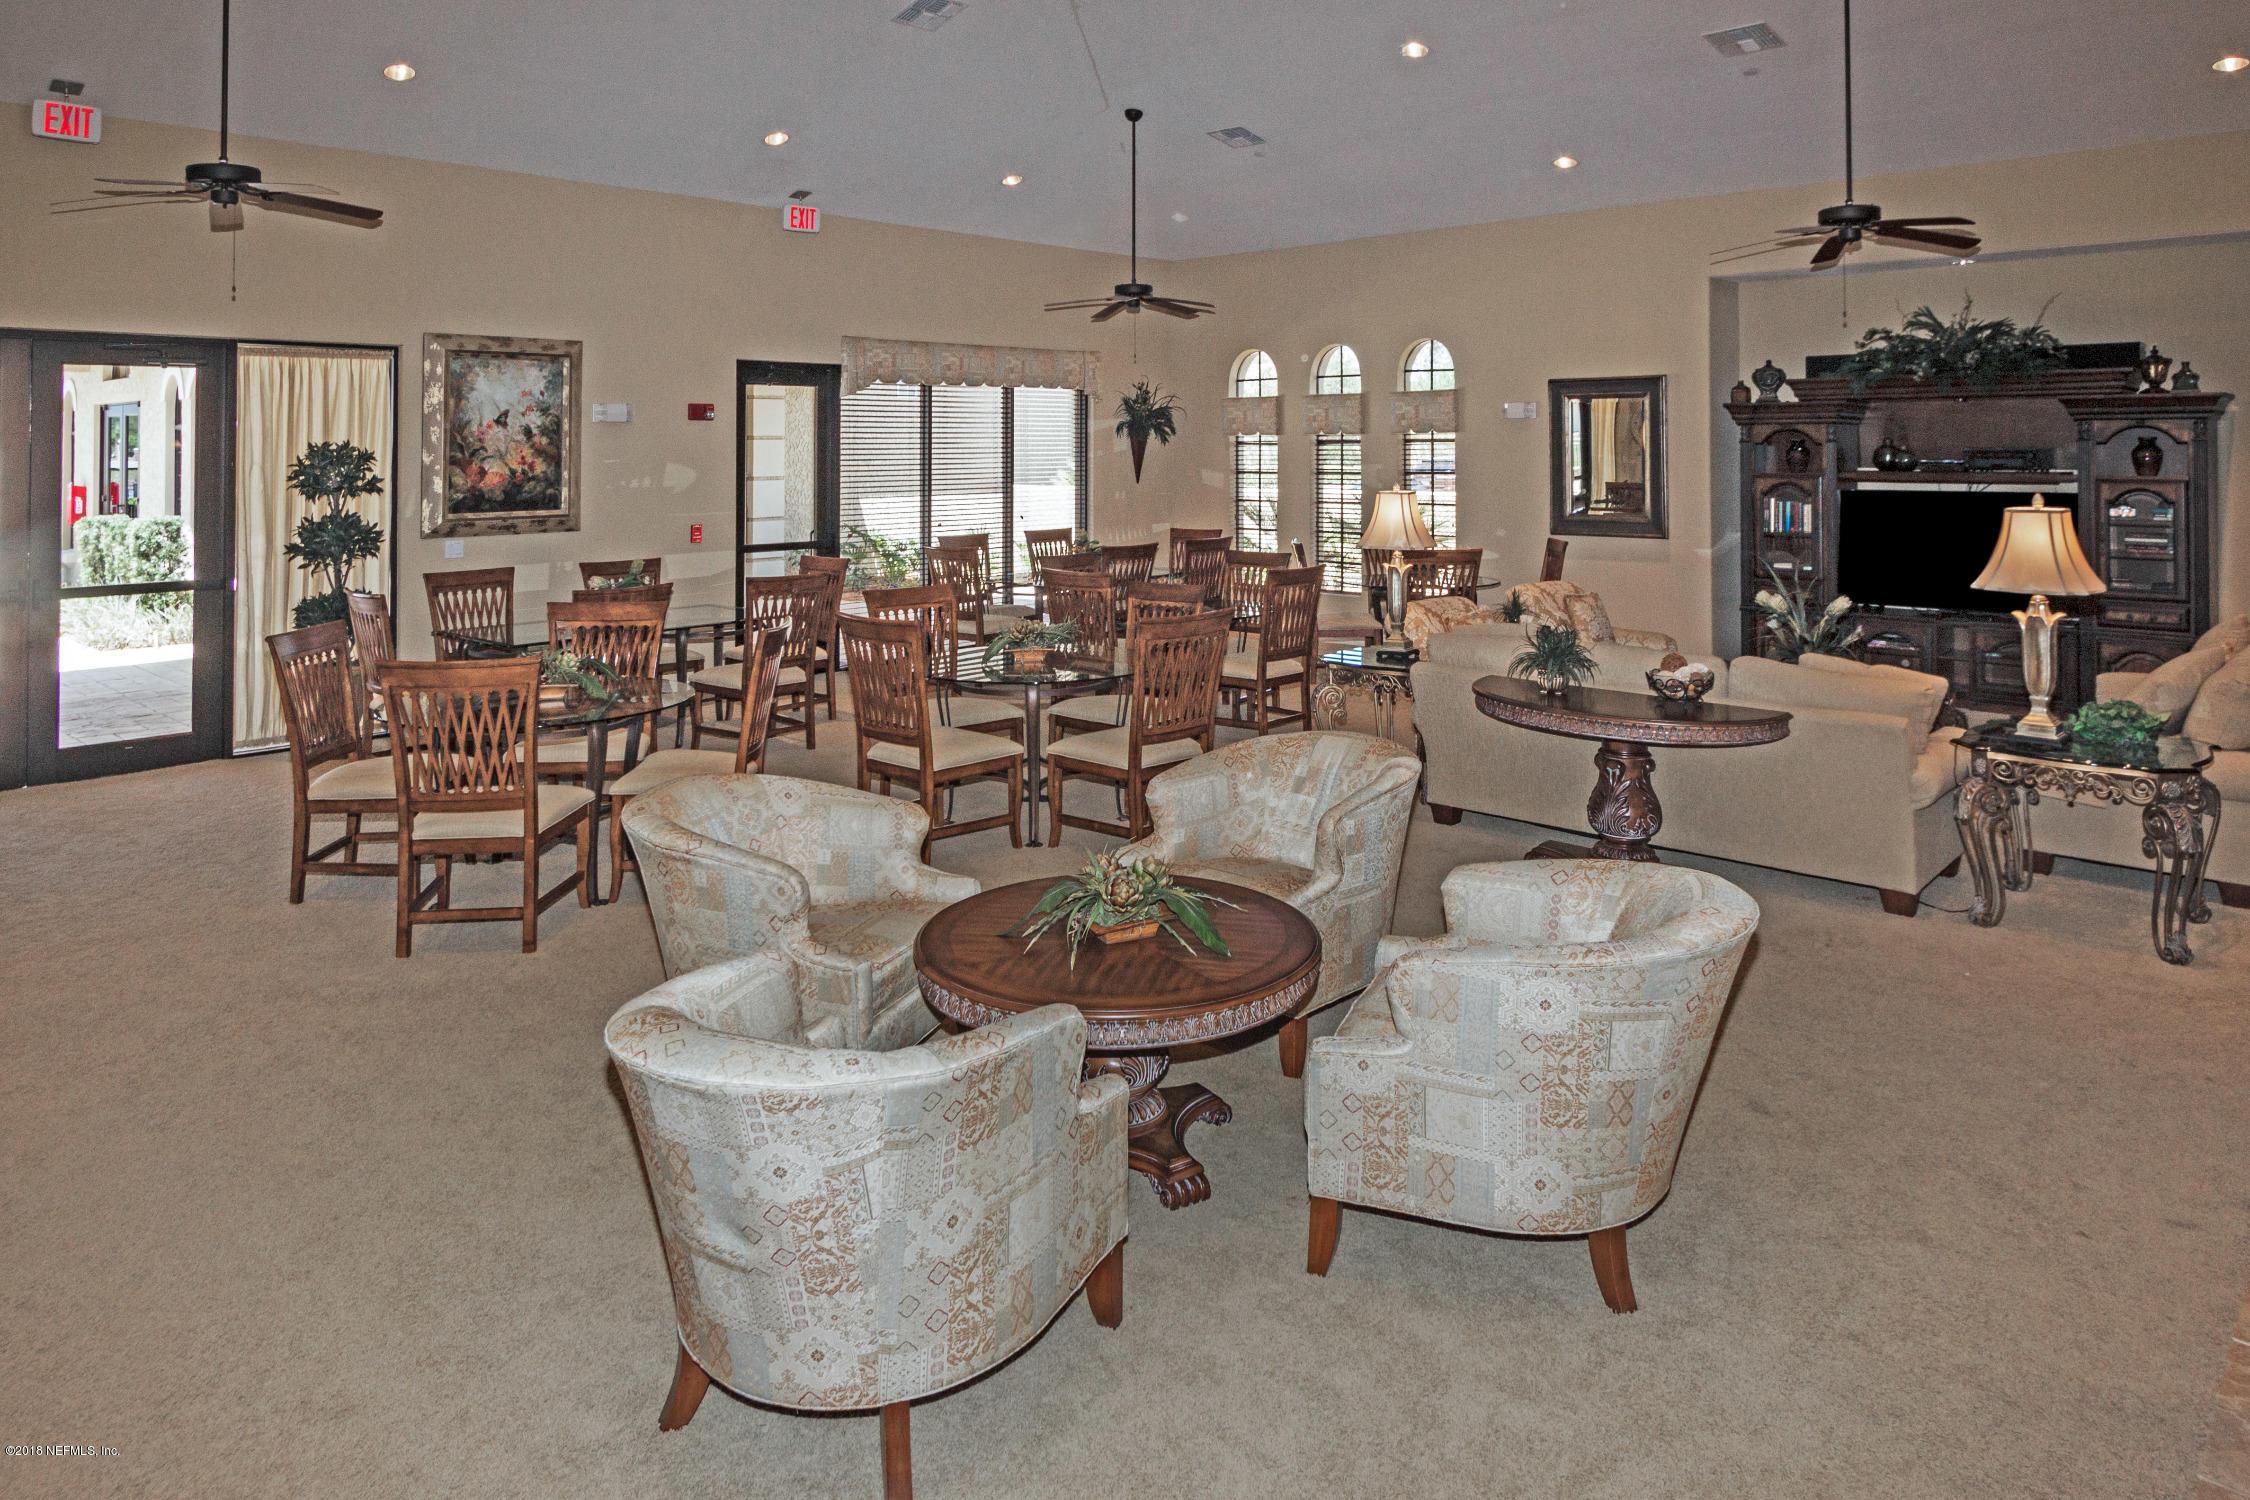 165 LATERRA LINKS, ST AUGUSTINE, FLORIDA 32092, 3 Bedrooms Bedrooms, ,3 BathroomsBathrooms,Residential,For sale,LATERRA LINKS,1047417